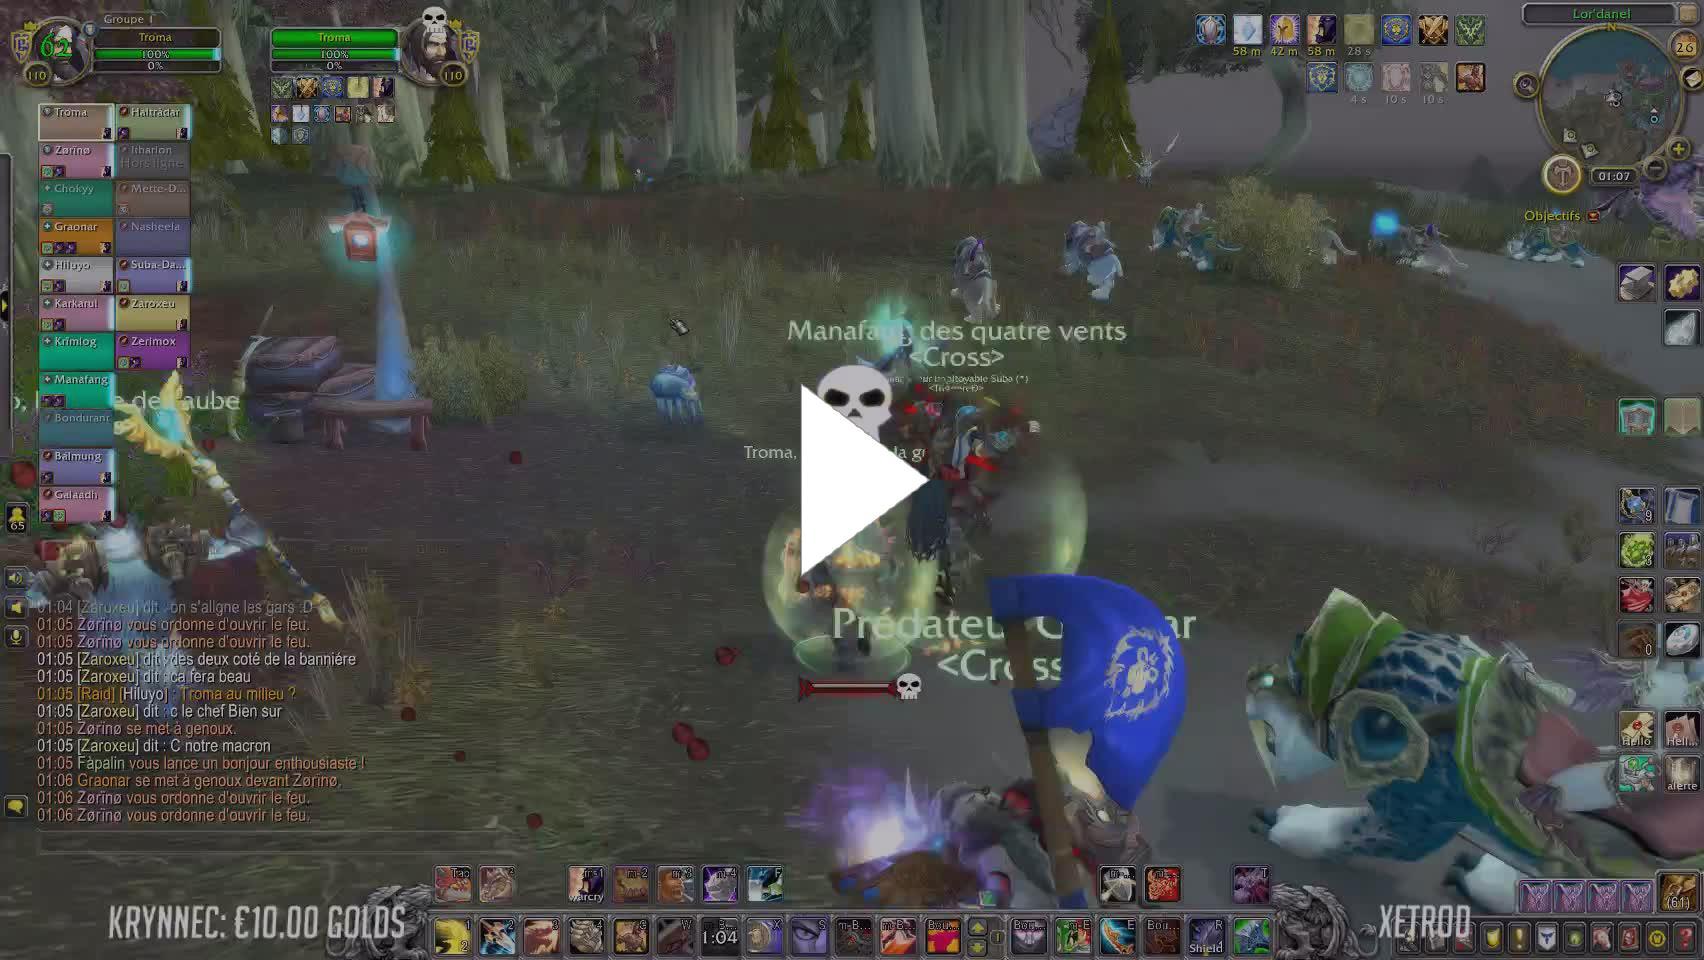 Troma - emilio fail - Twitch